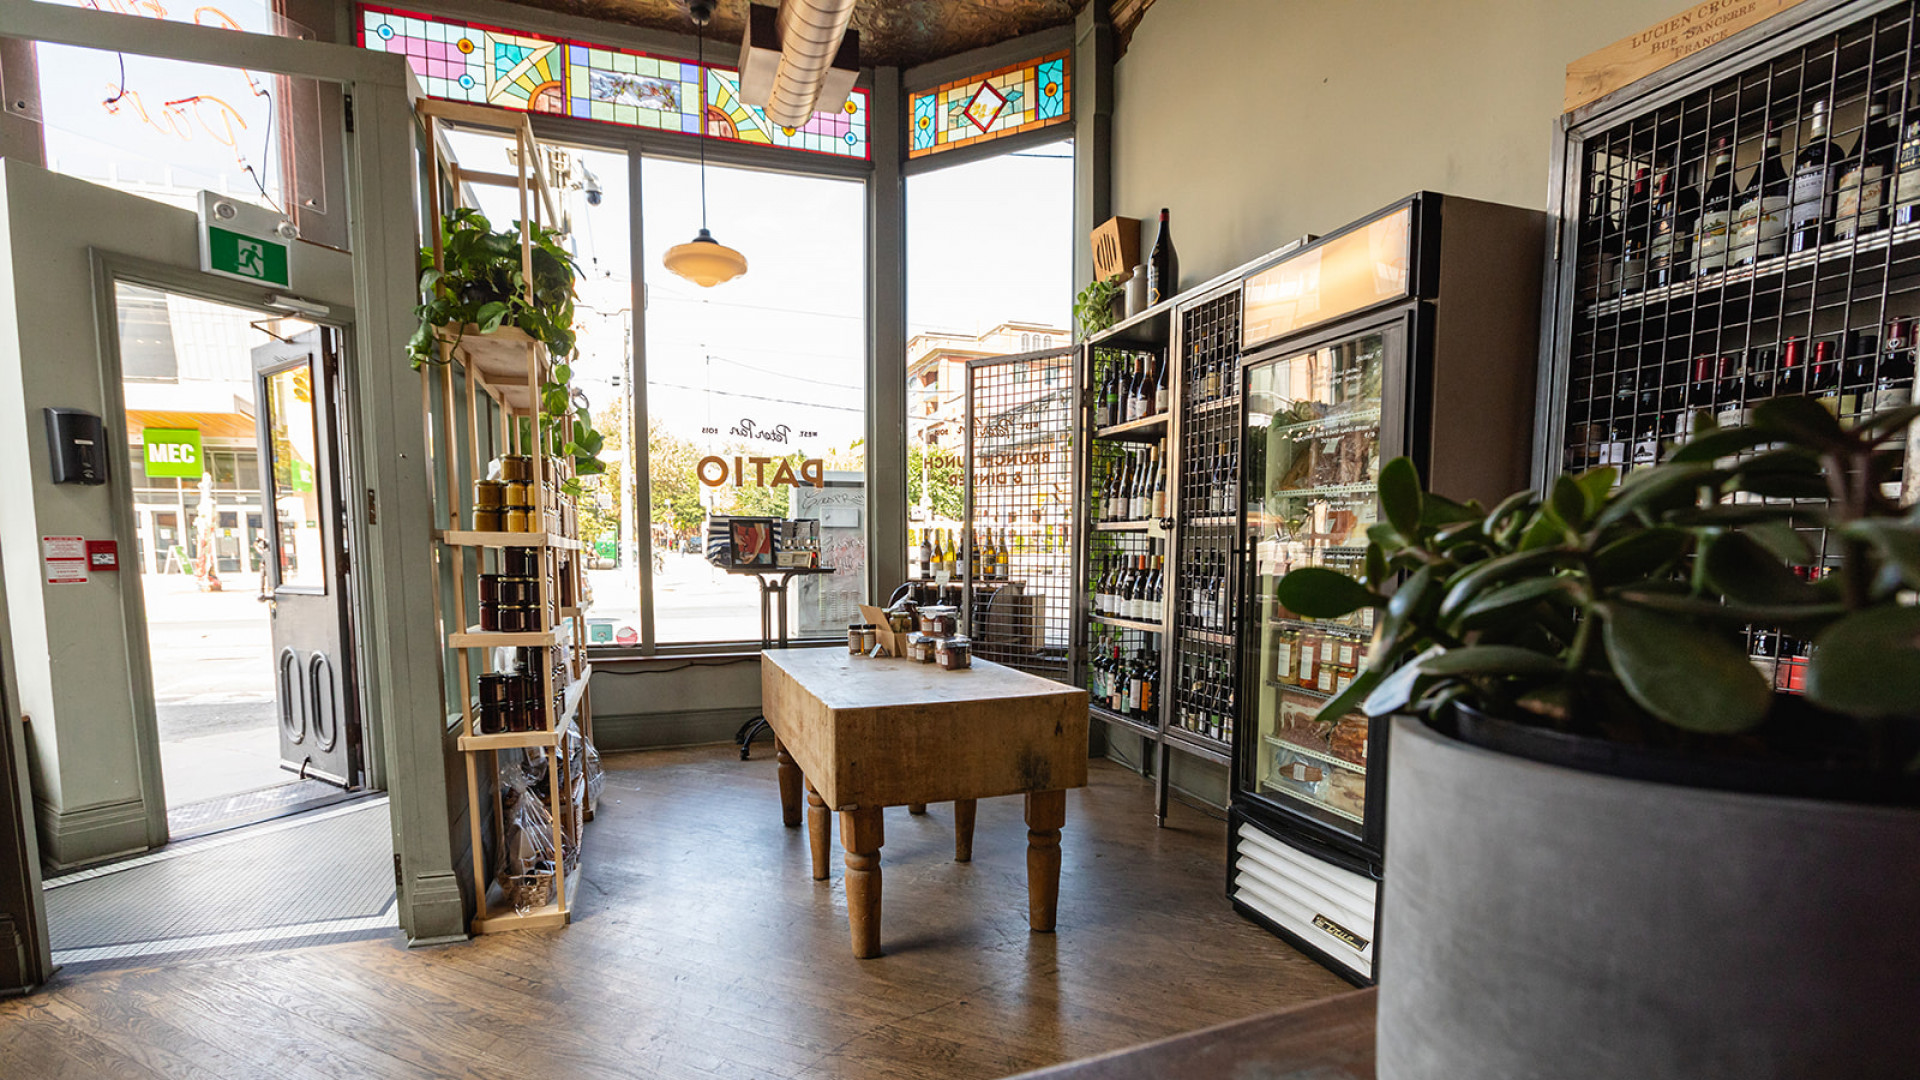 The best bottle shops in Toronto | Inside Peter Pantry